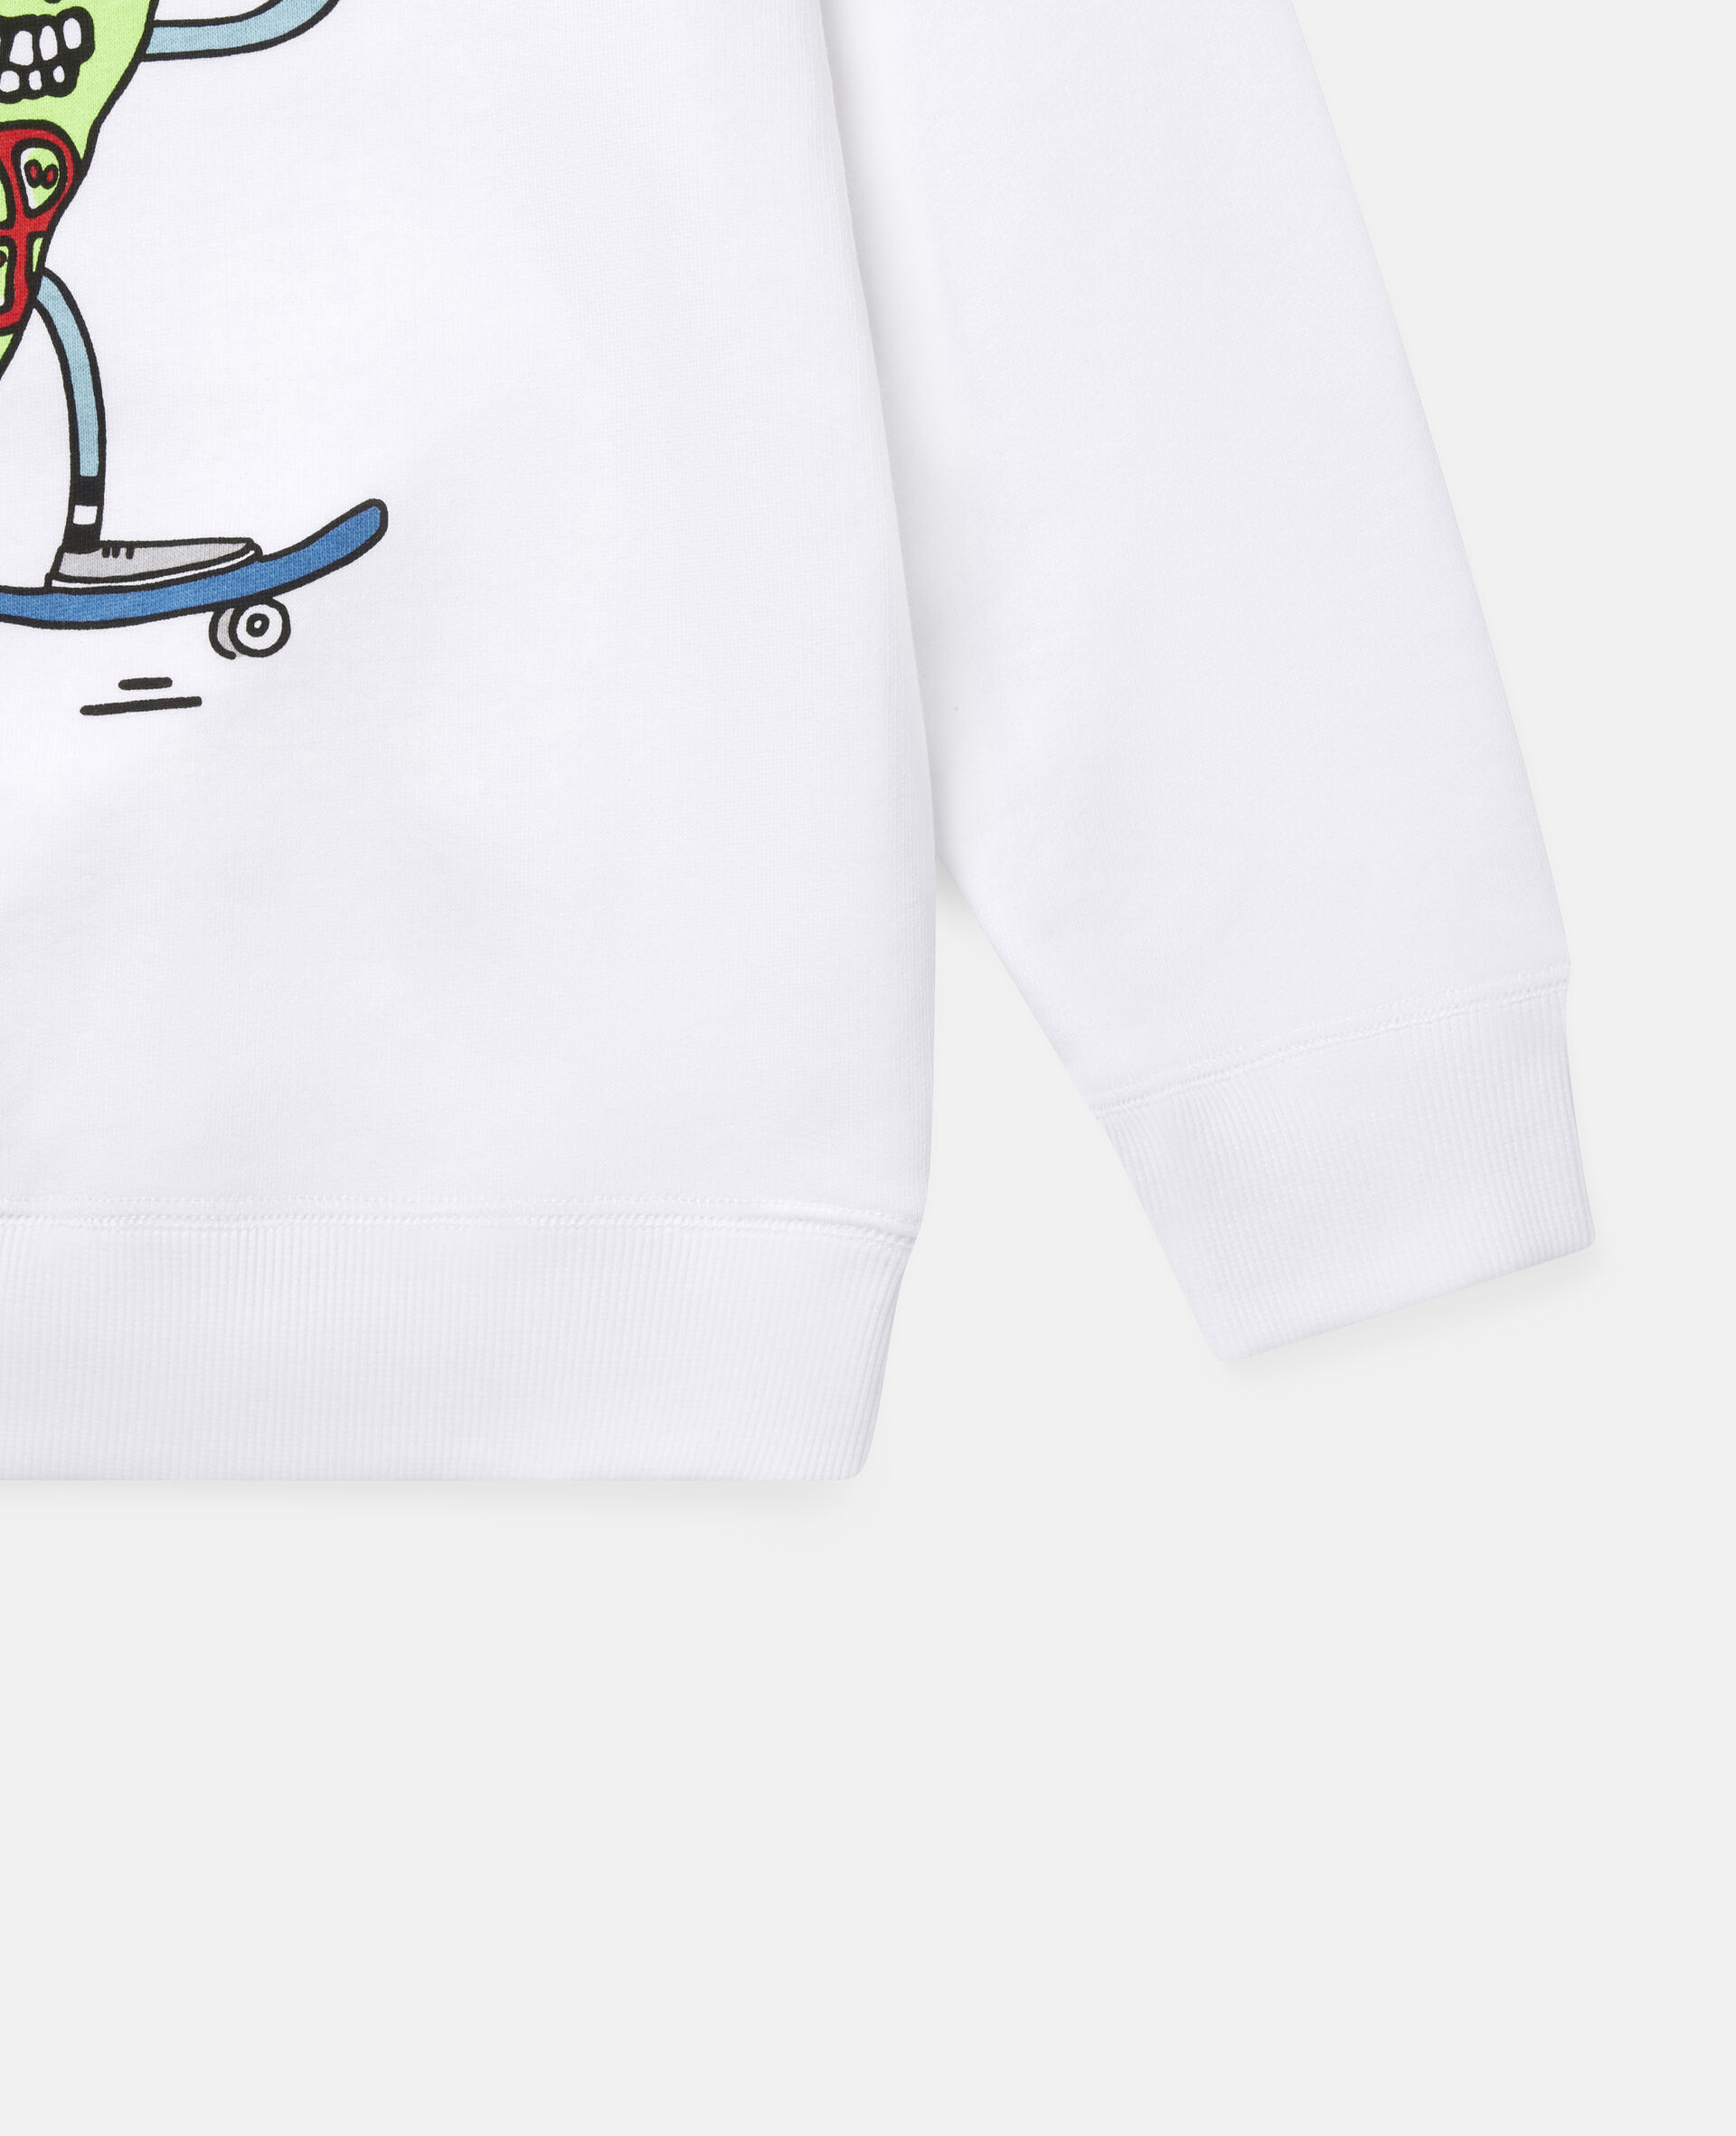 披萨滑板运动员印花抓绒运动衫-白色-large image number 2